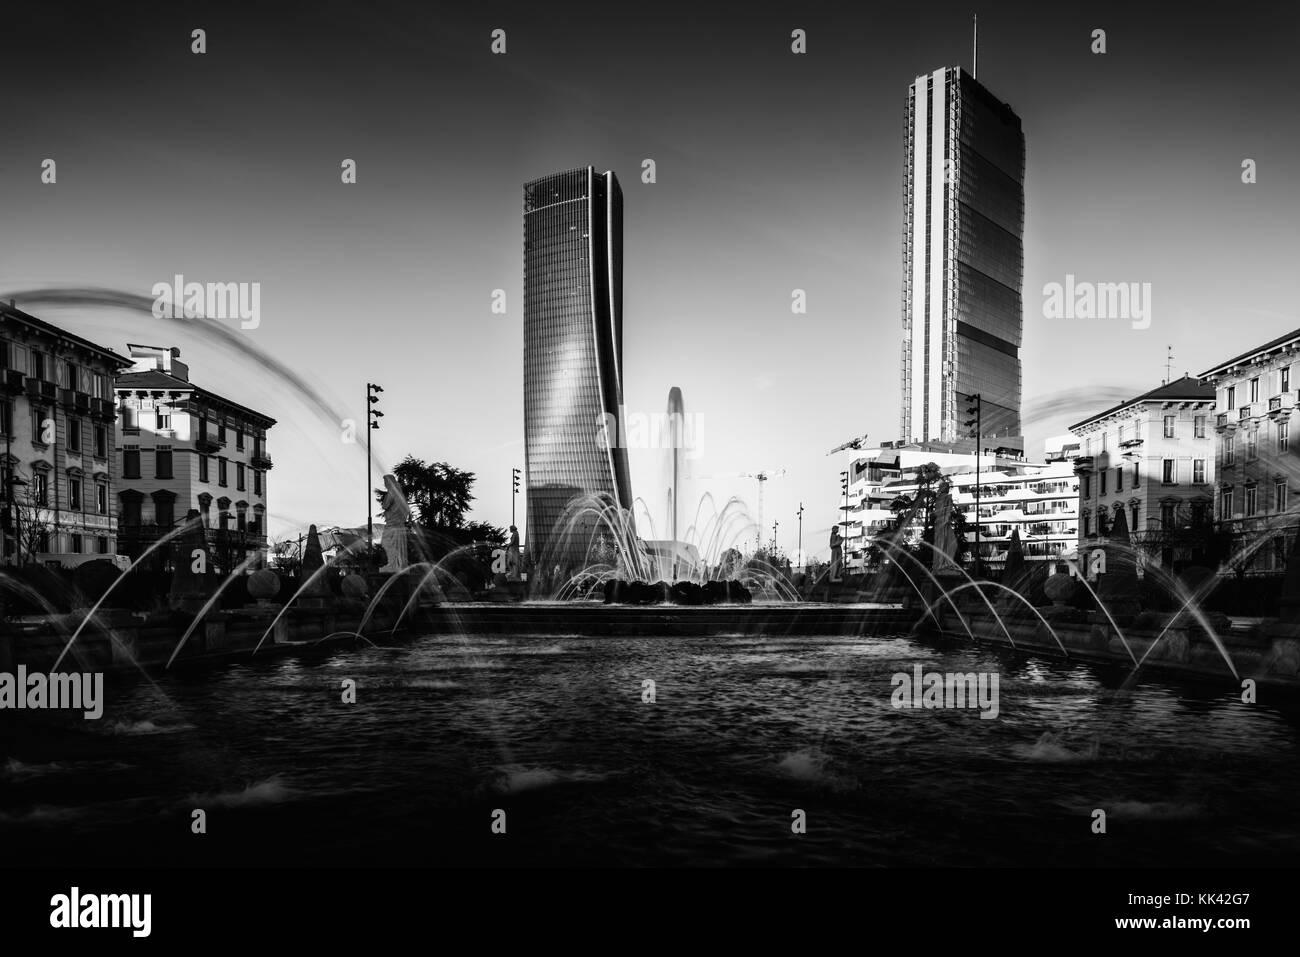 citylife-modern-district-of-milan-lombardy-italy-in-monochrome-fine-KK42G7.jpg